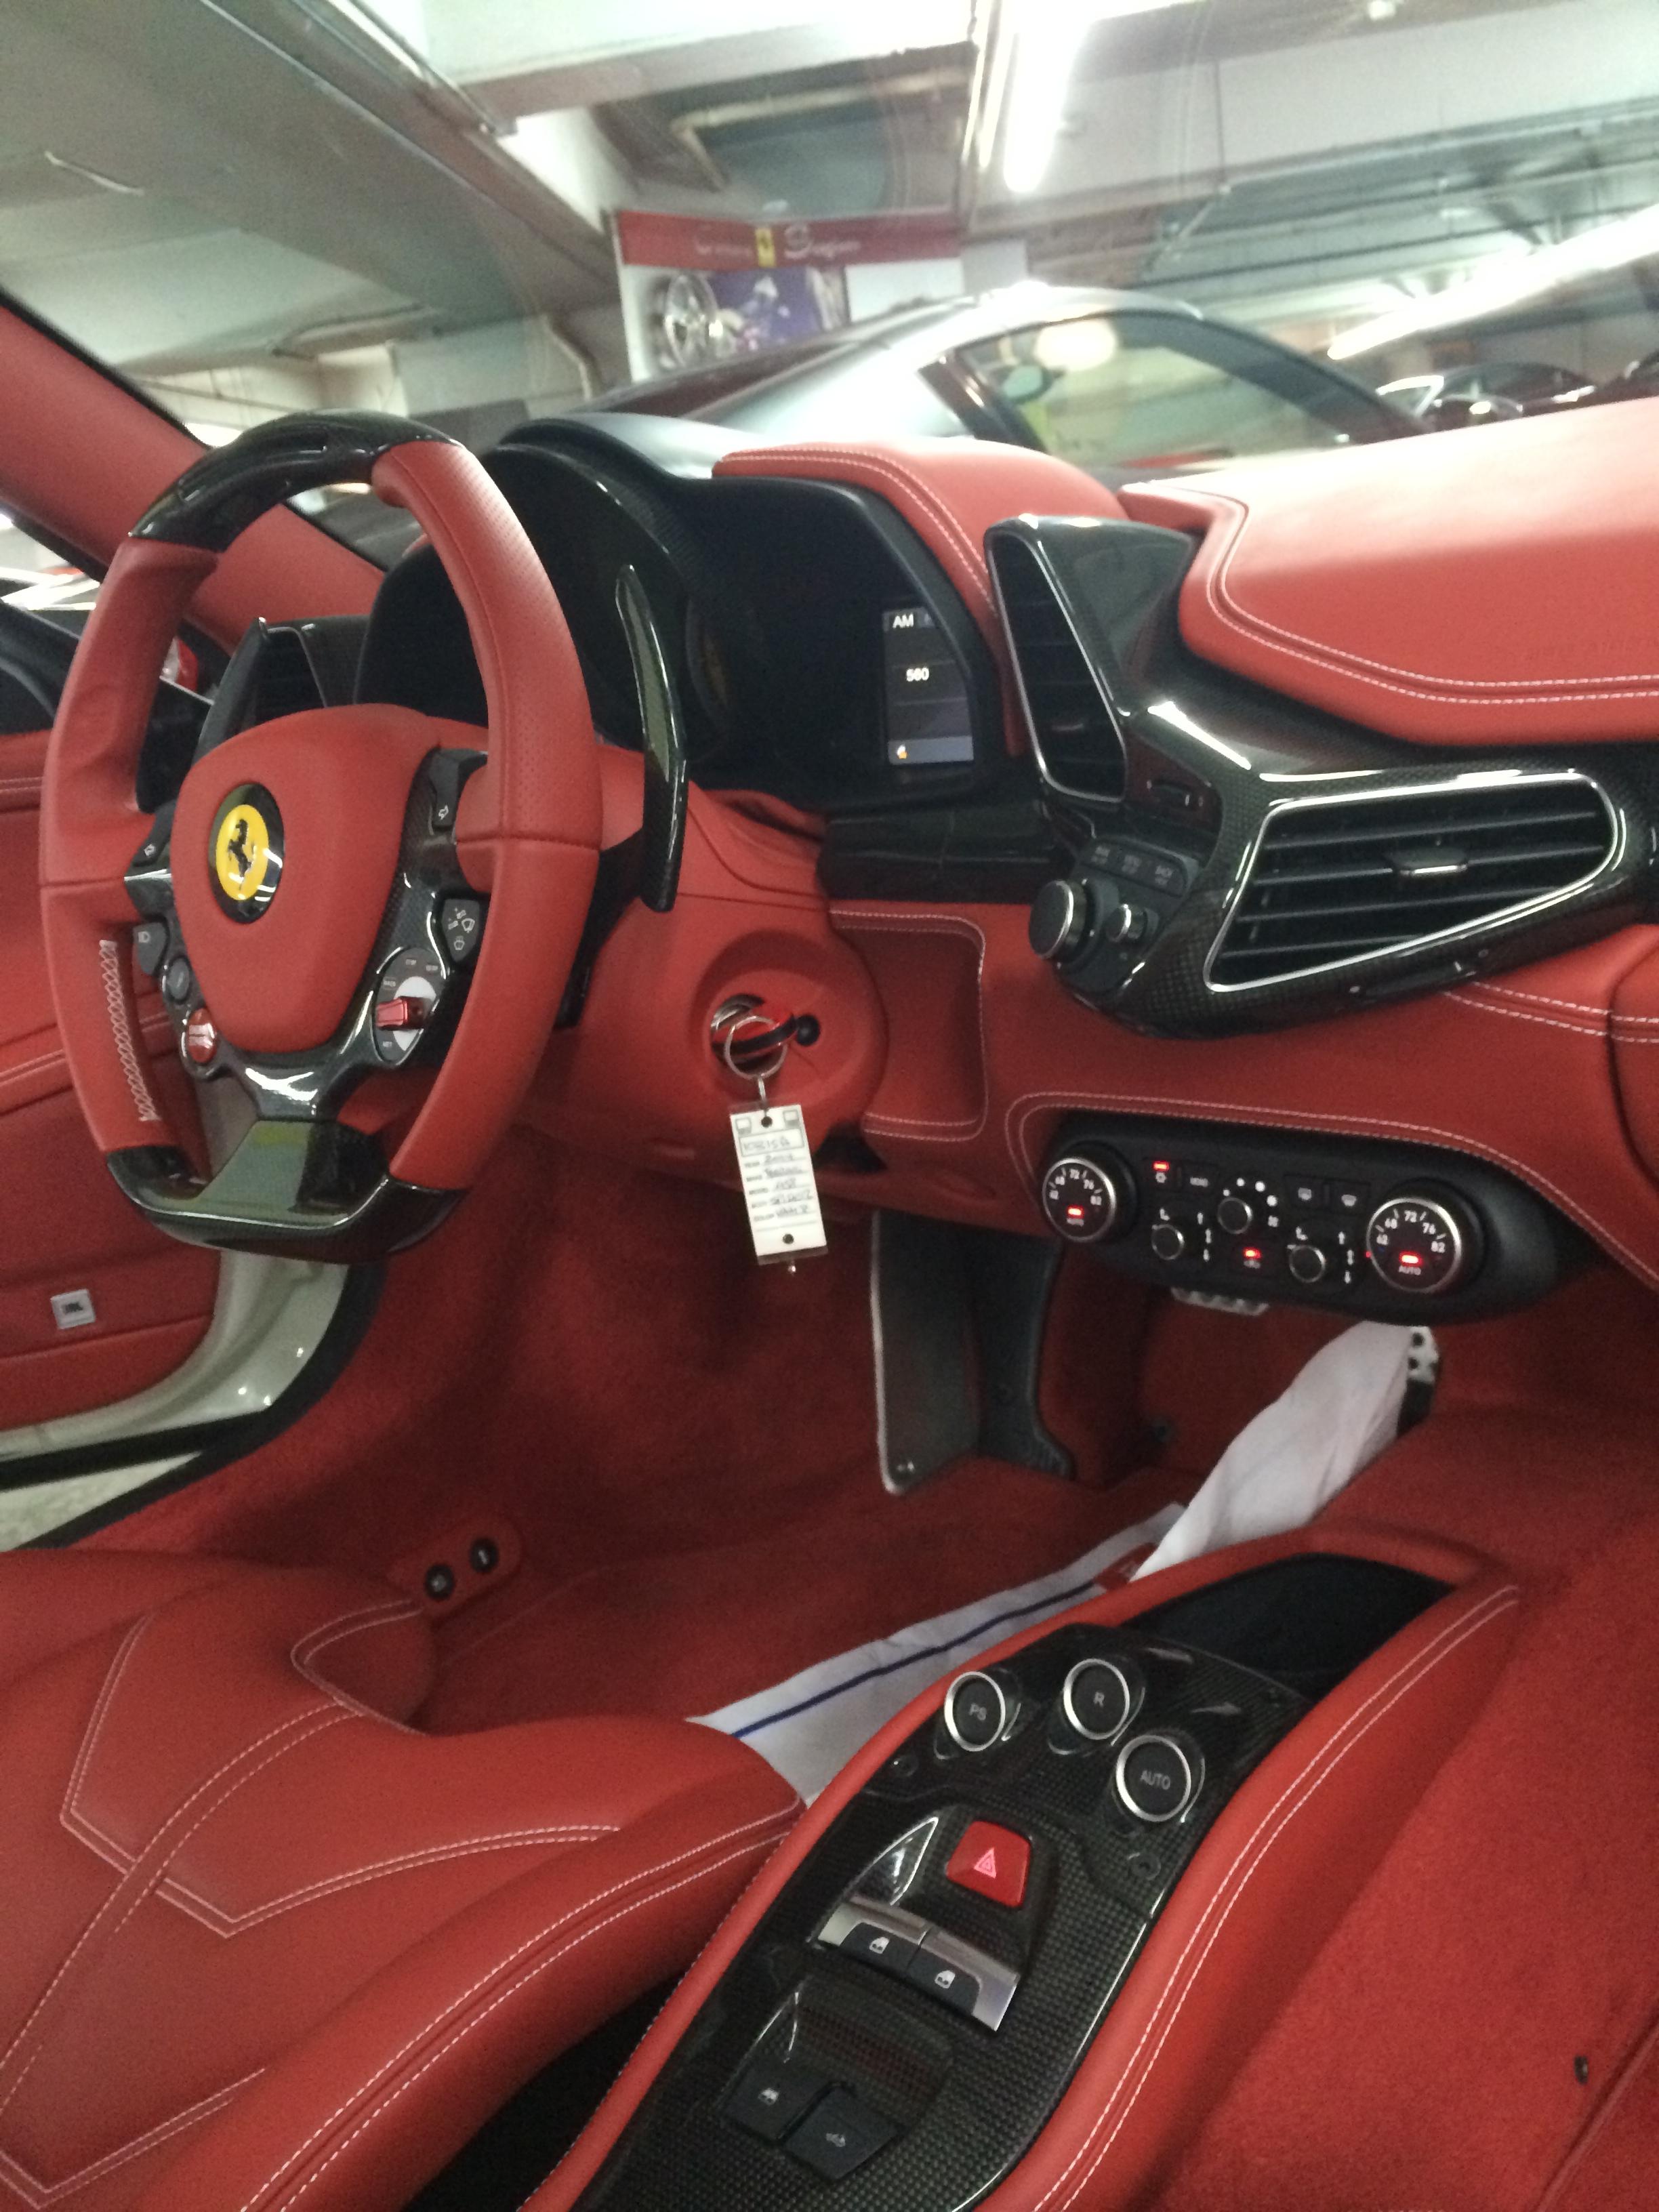 Ferrari Red California